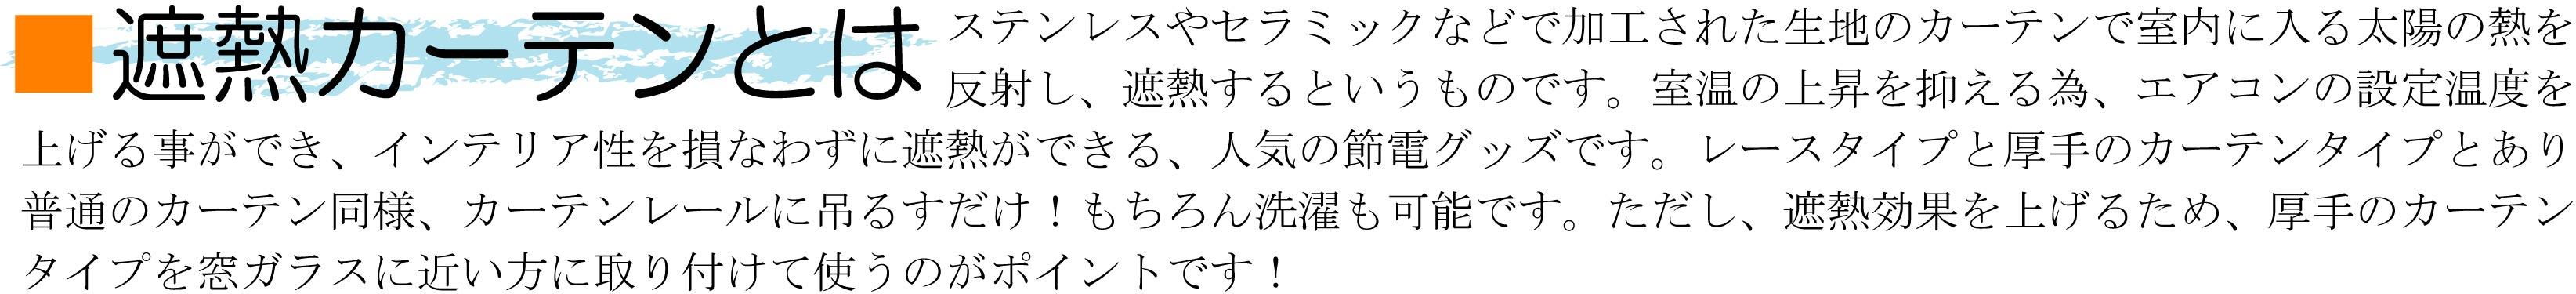 KuraSi-natu-sin75-10.jpg